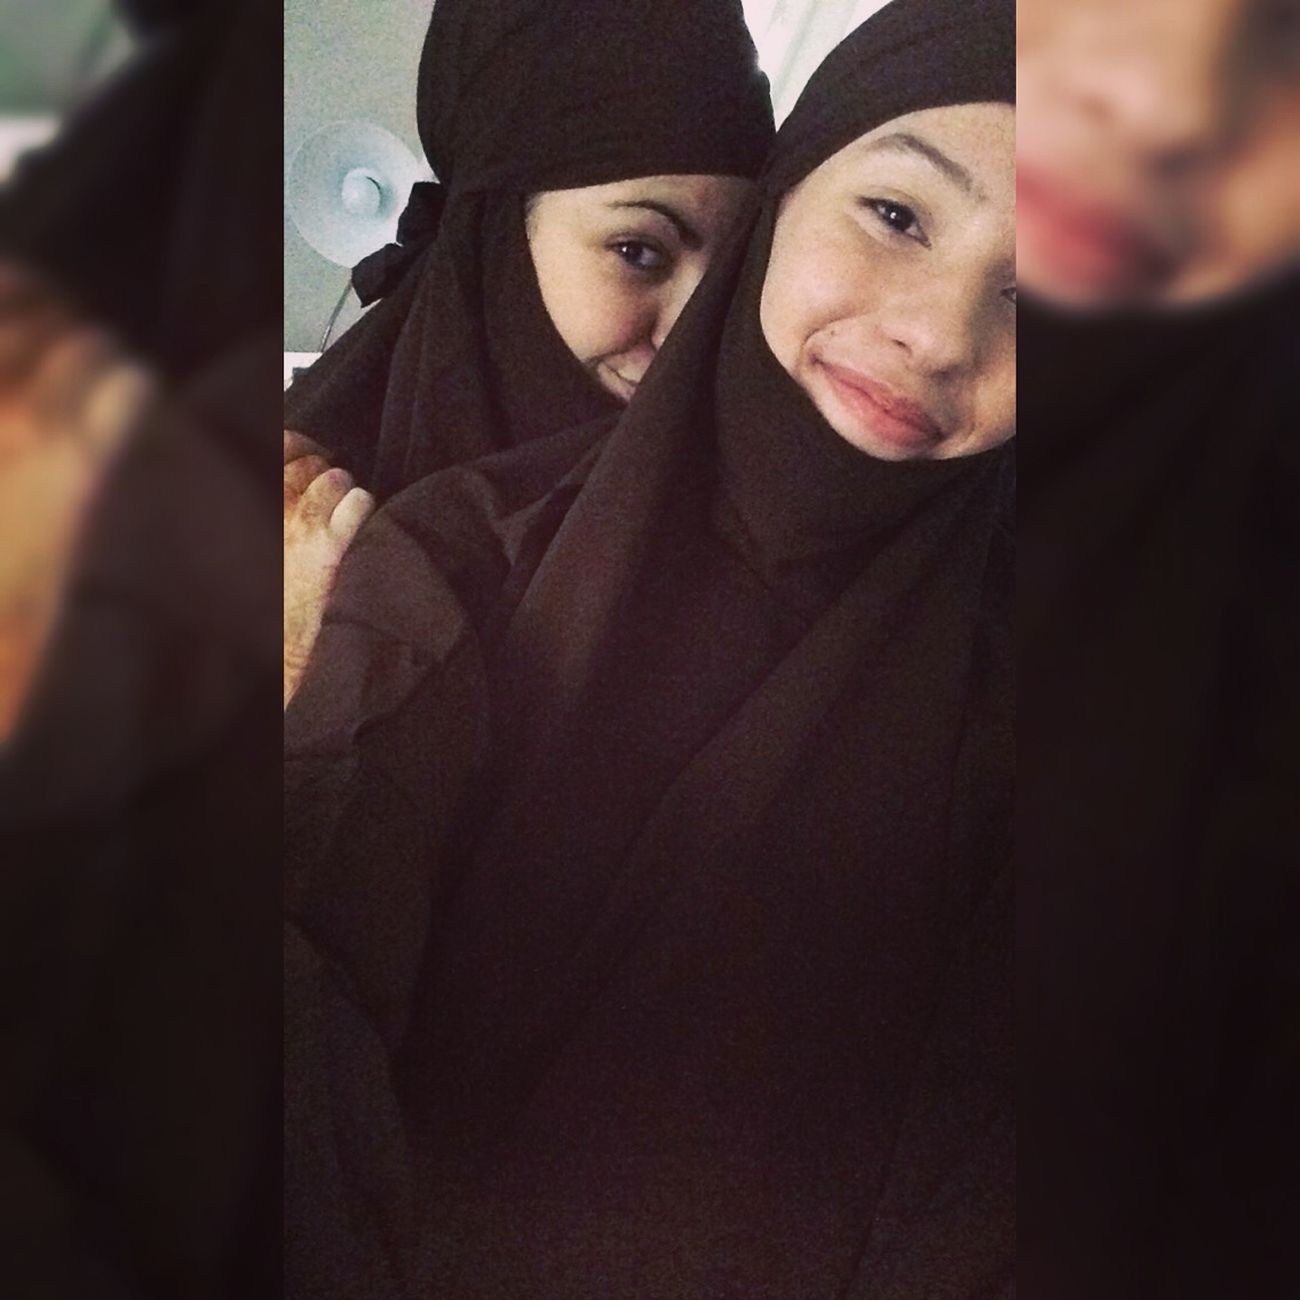 Salam Ukhty Jilbab Algerian Friends Muslimah 👭🙏🏽💘